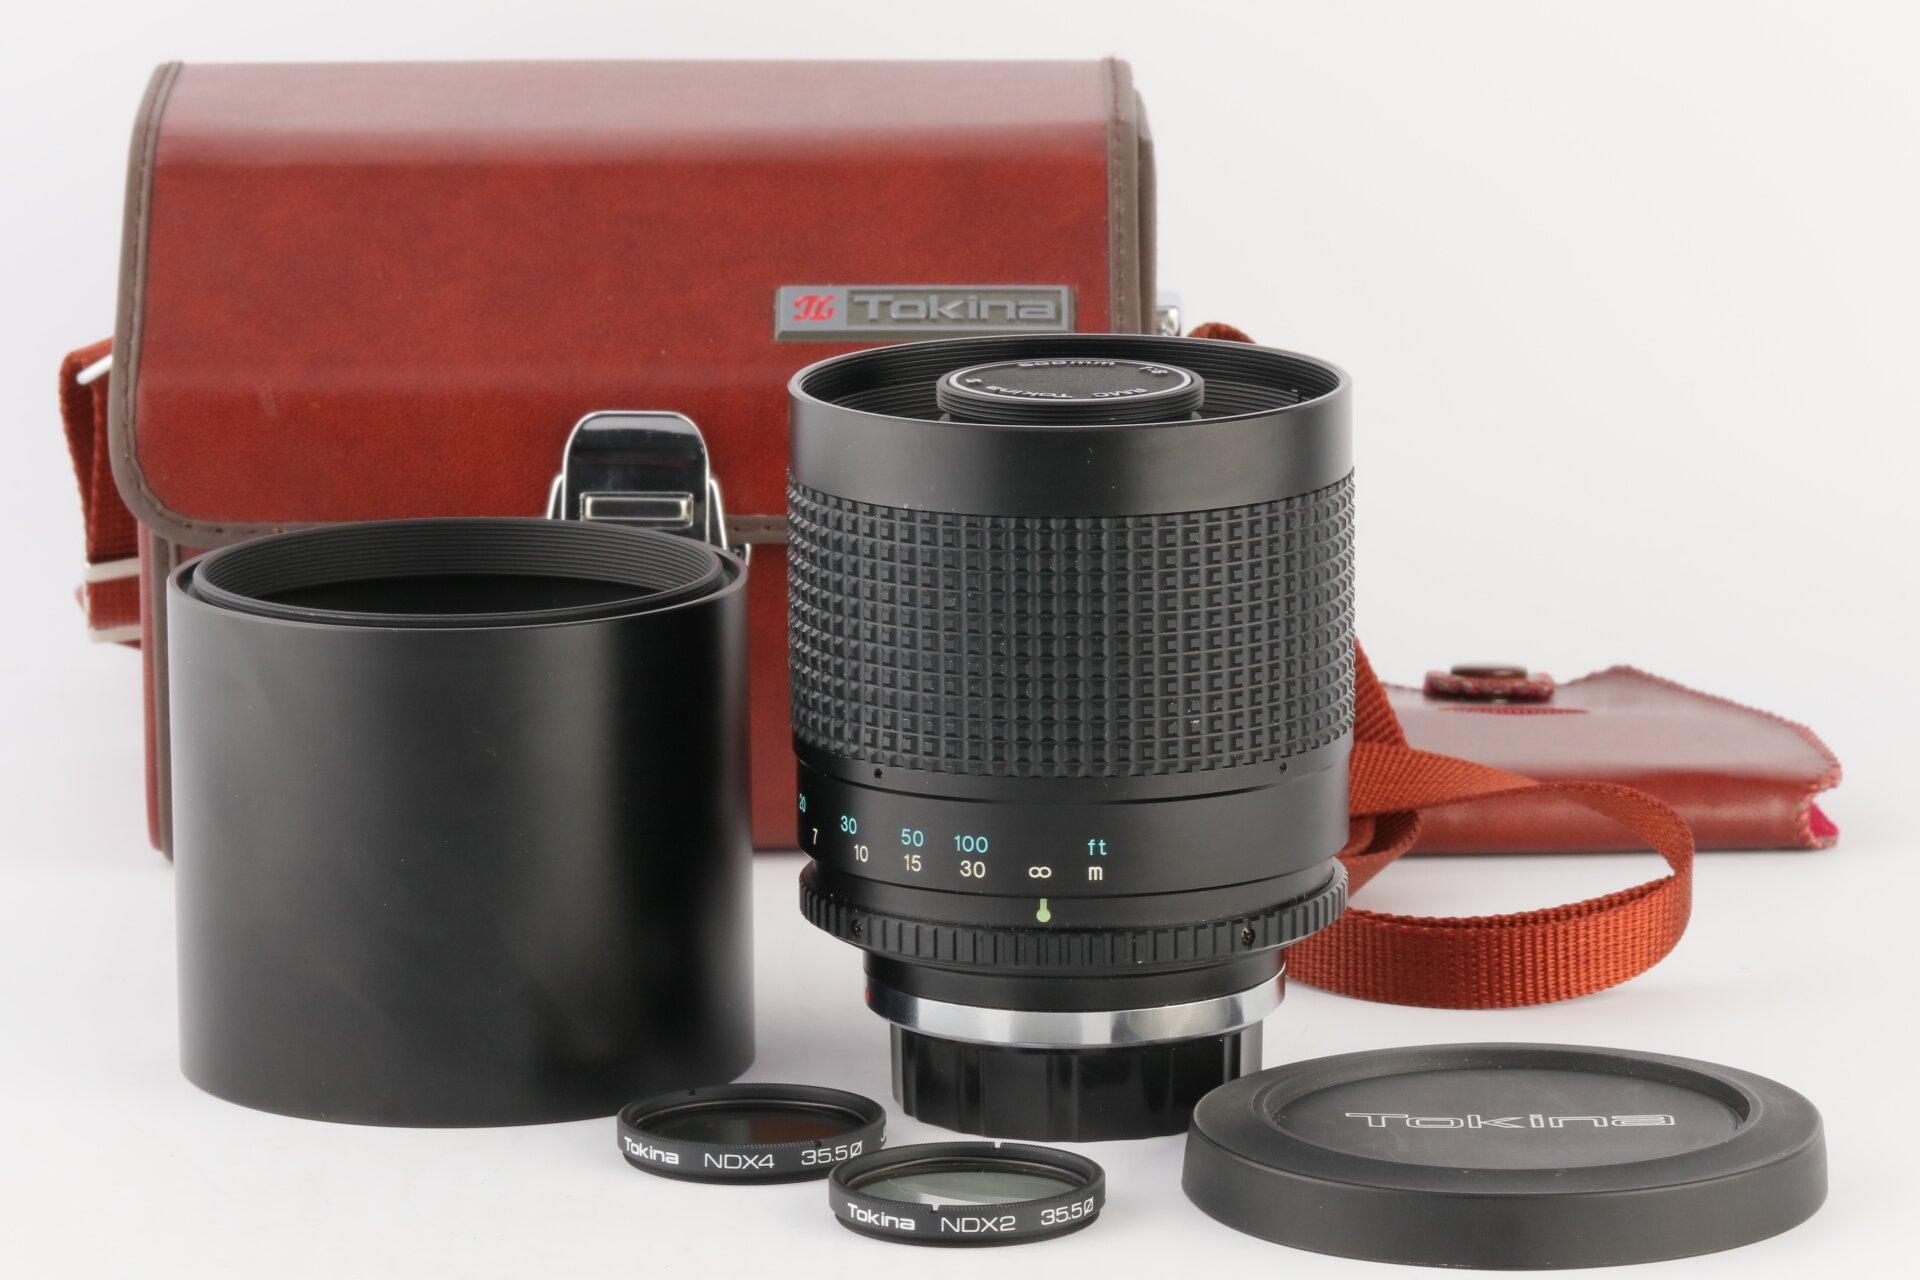 Tokina Siegelobjektiv 500mm 8 RMC Contax/Yashica